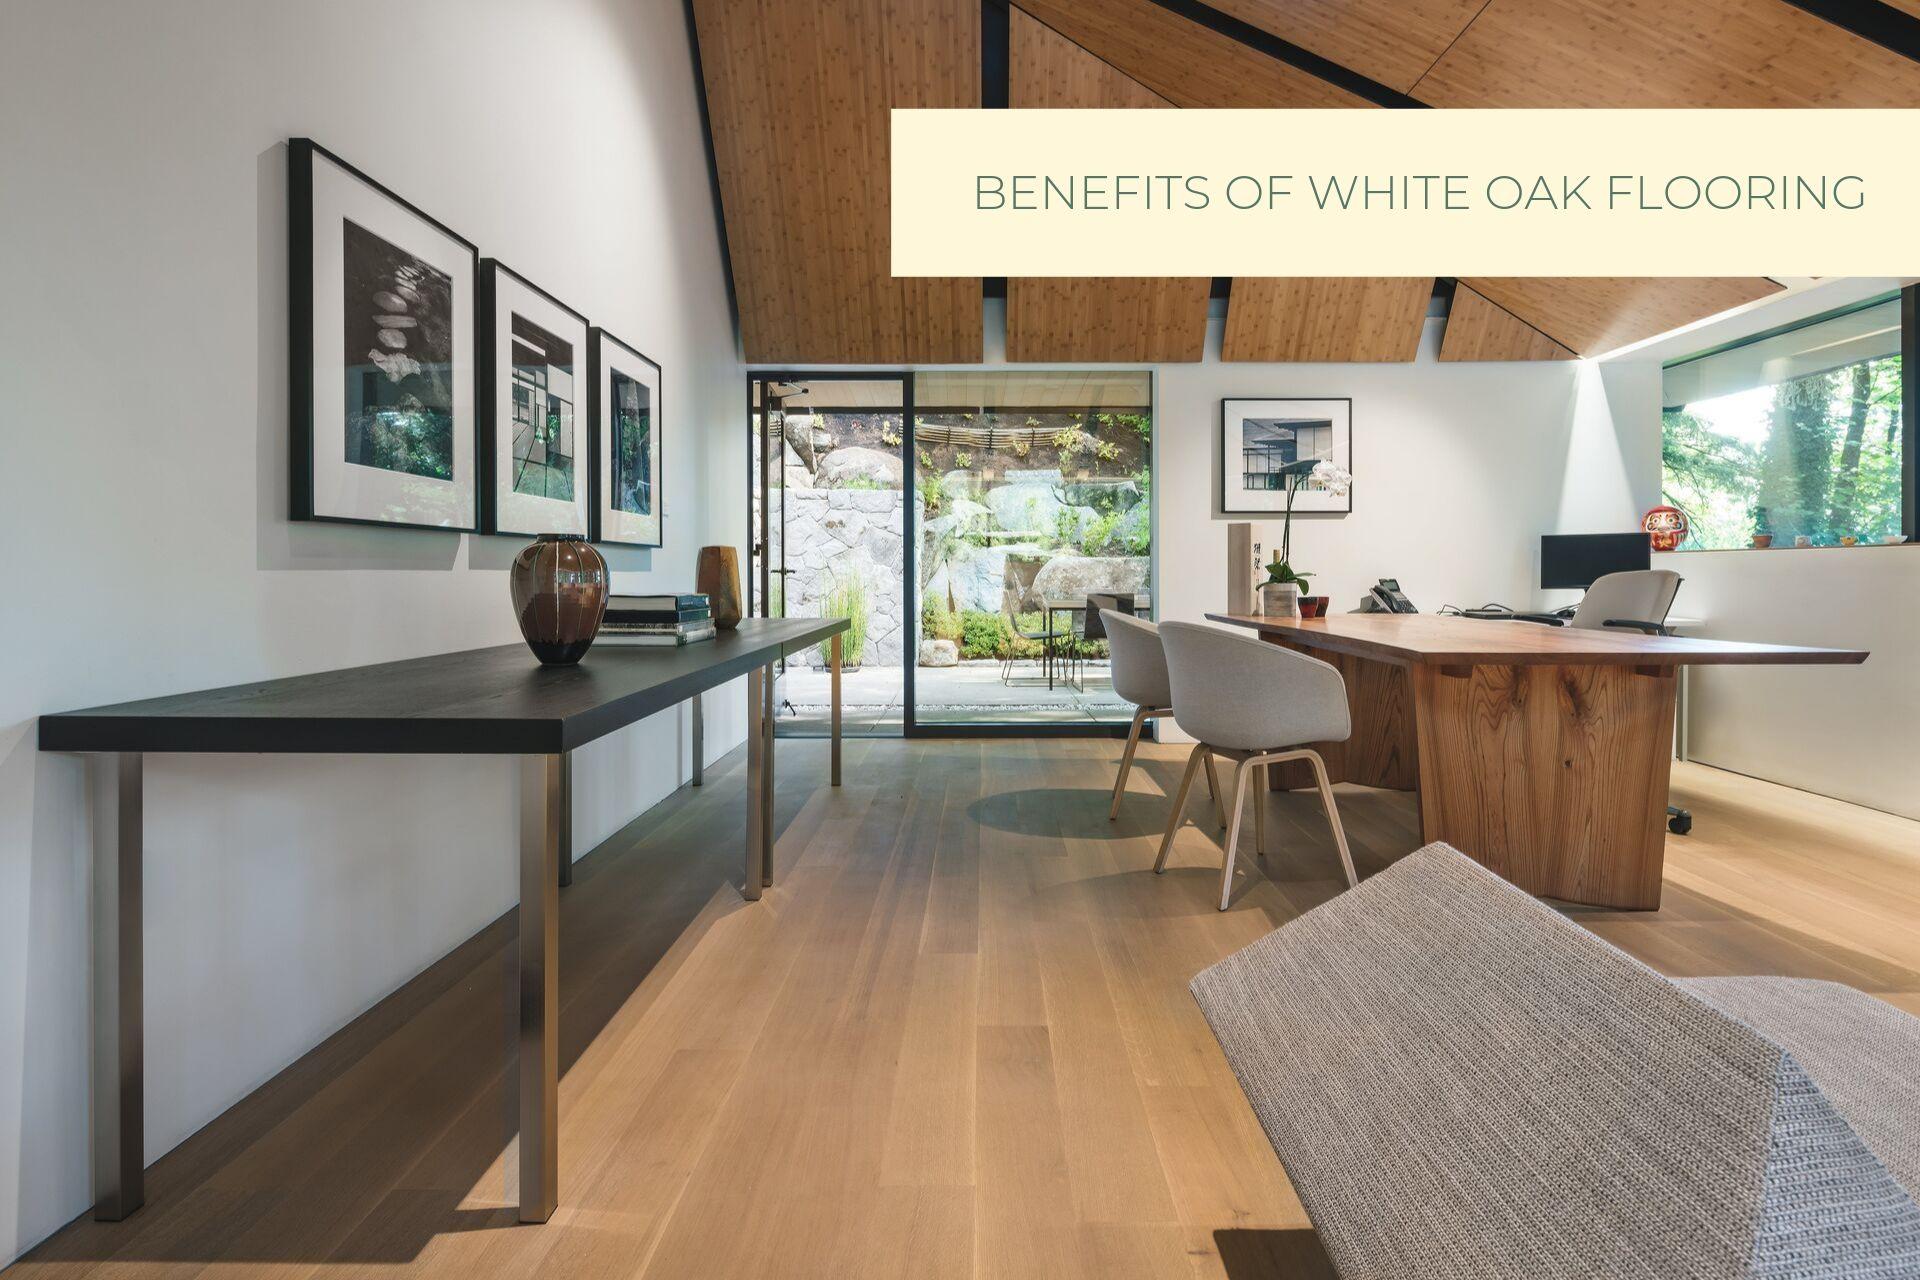 Castle Bespoke_ Benefits of White Oak Flooring